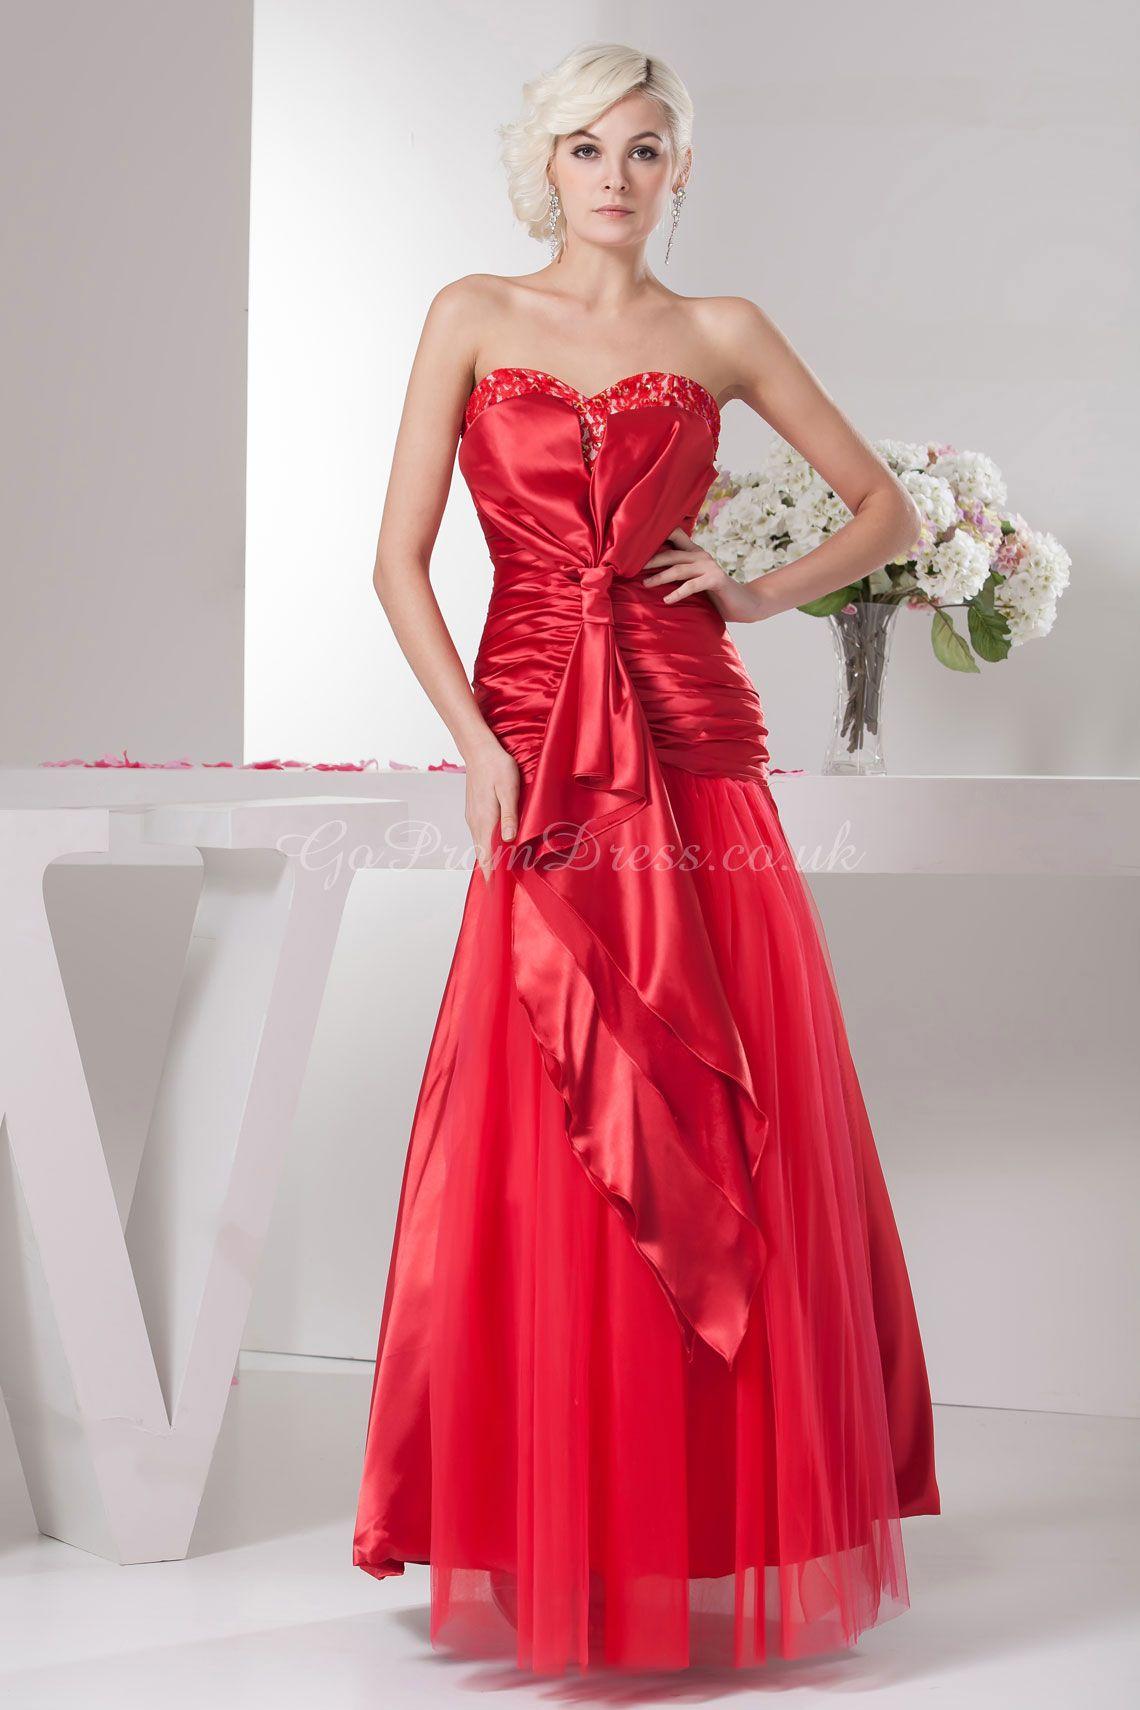 4bacc2bfe74163 A-line Elastic Silk Like Satin Tulle Sweetheart Natural Waist Floor-Length  Zipper Sleeveless Beading Bowknot Ruching prom dress